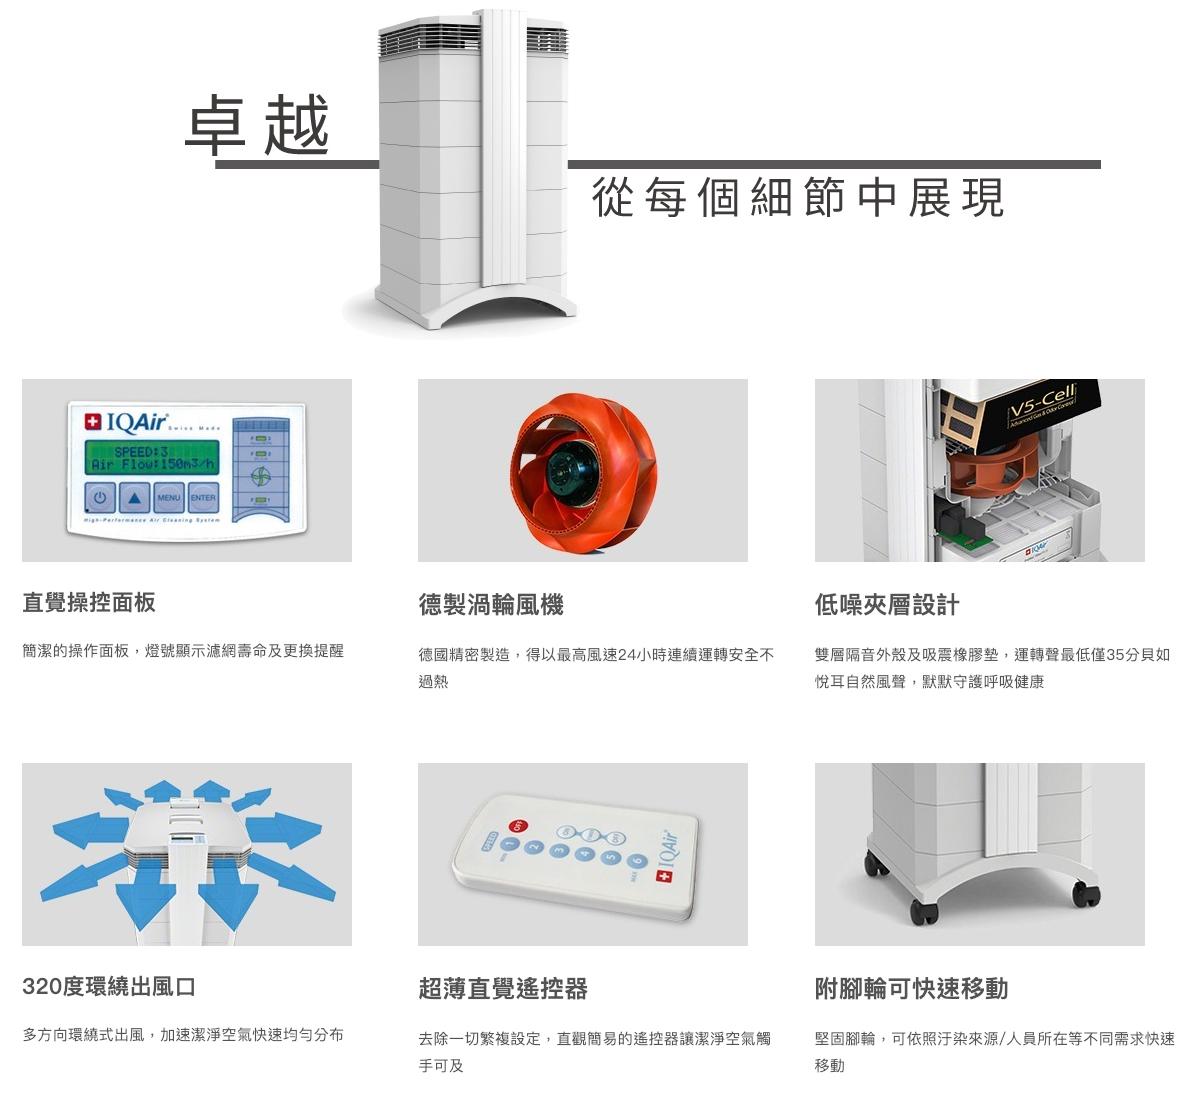 IQAir 空氣淨化系統 (HealthPro 150)   Costco 好市多線上購物